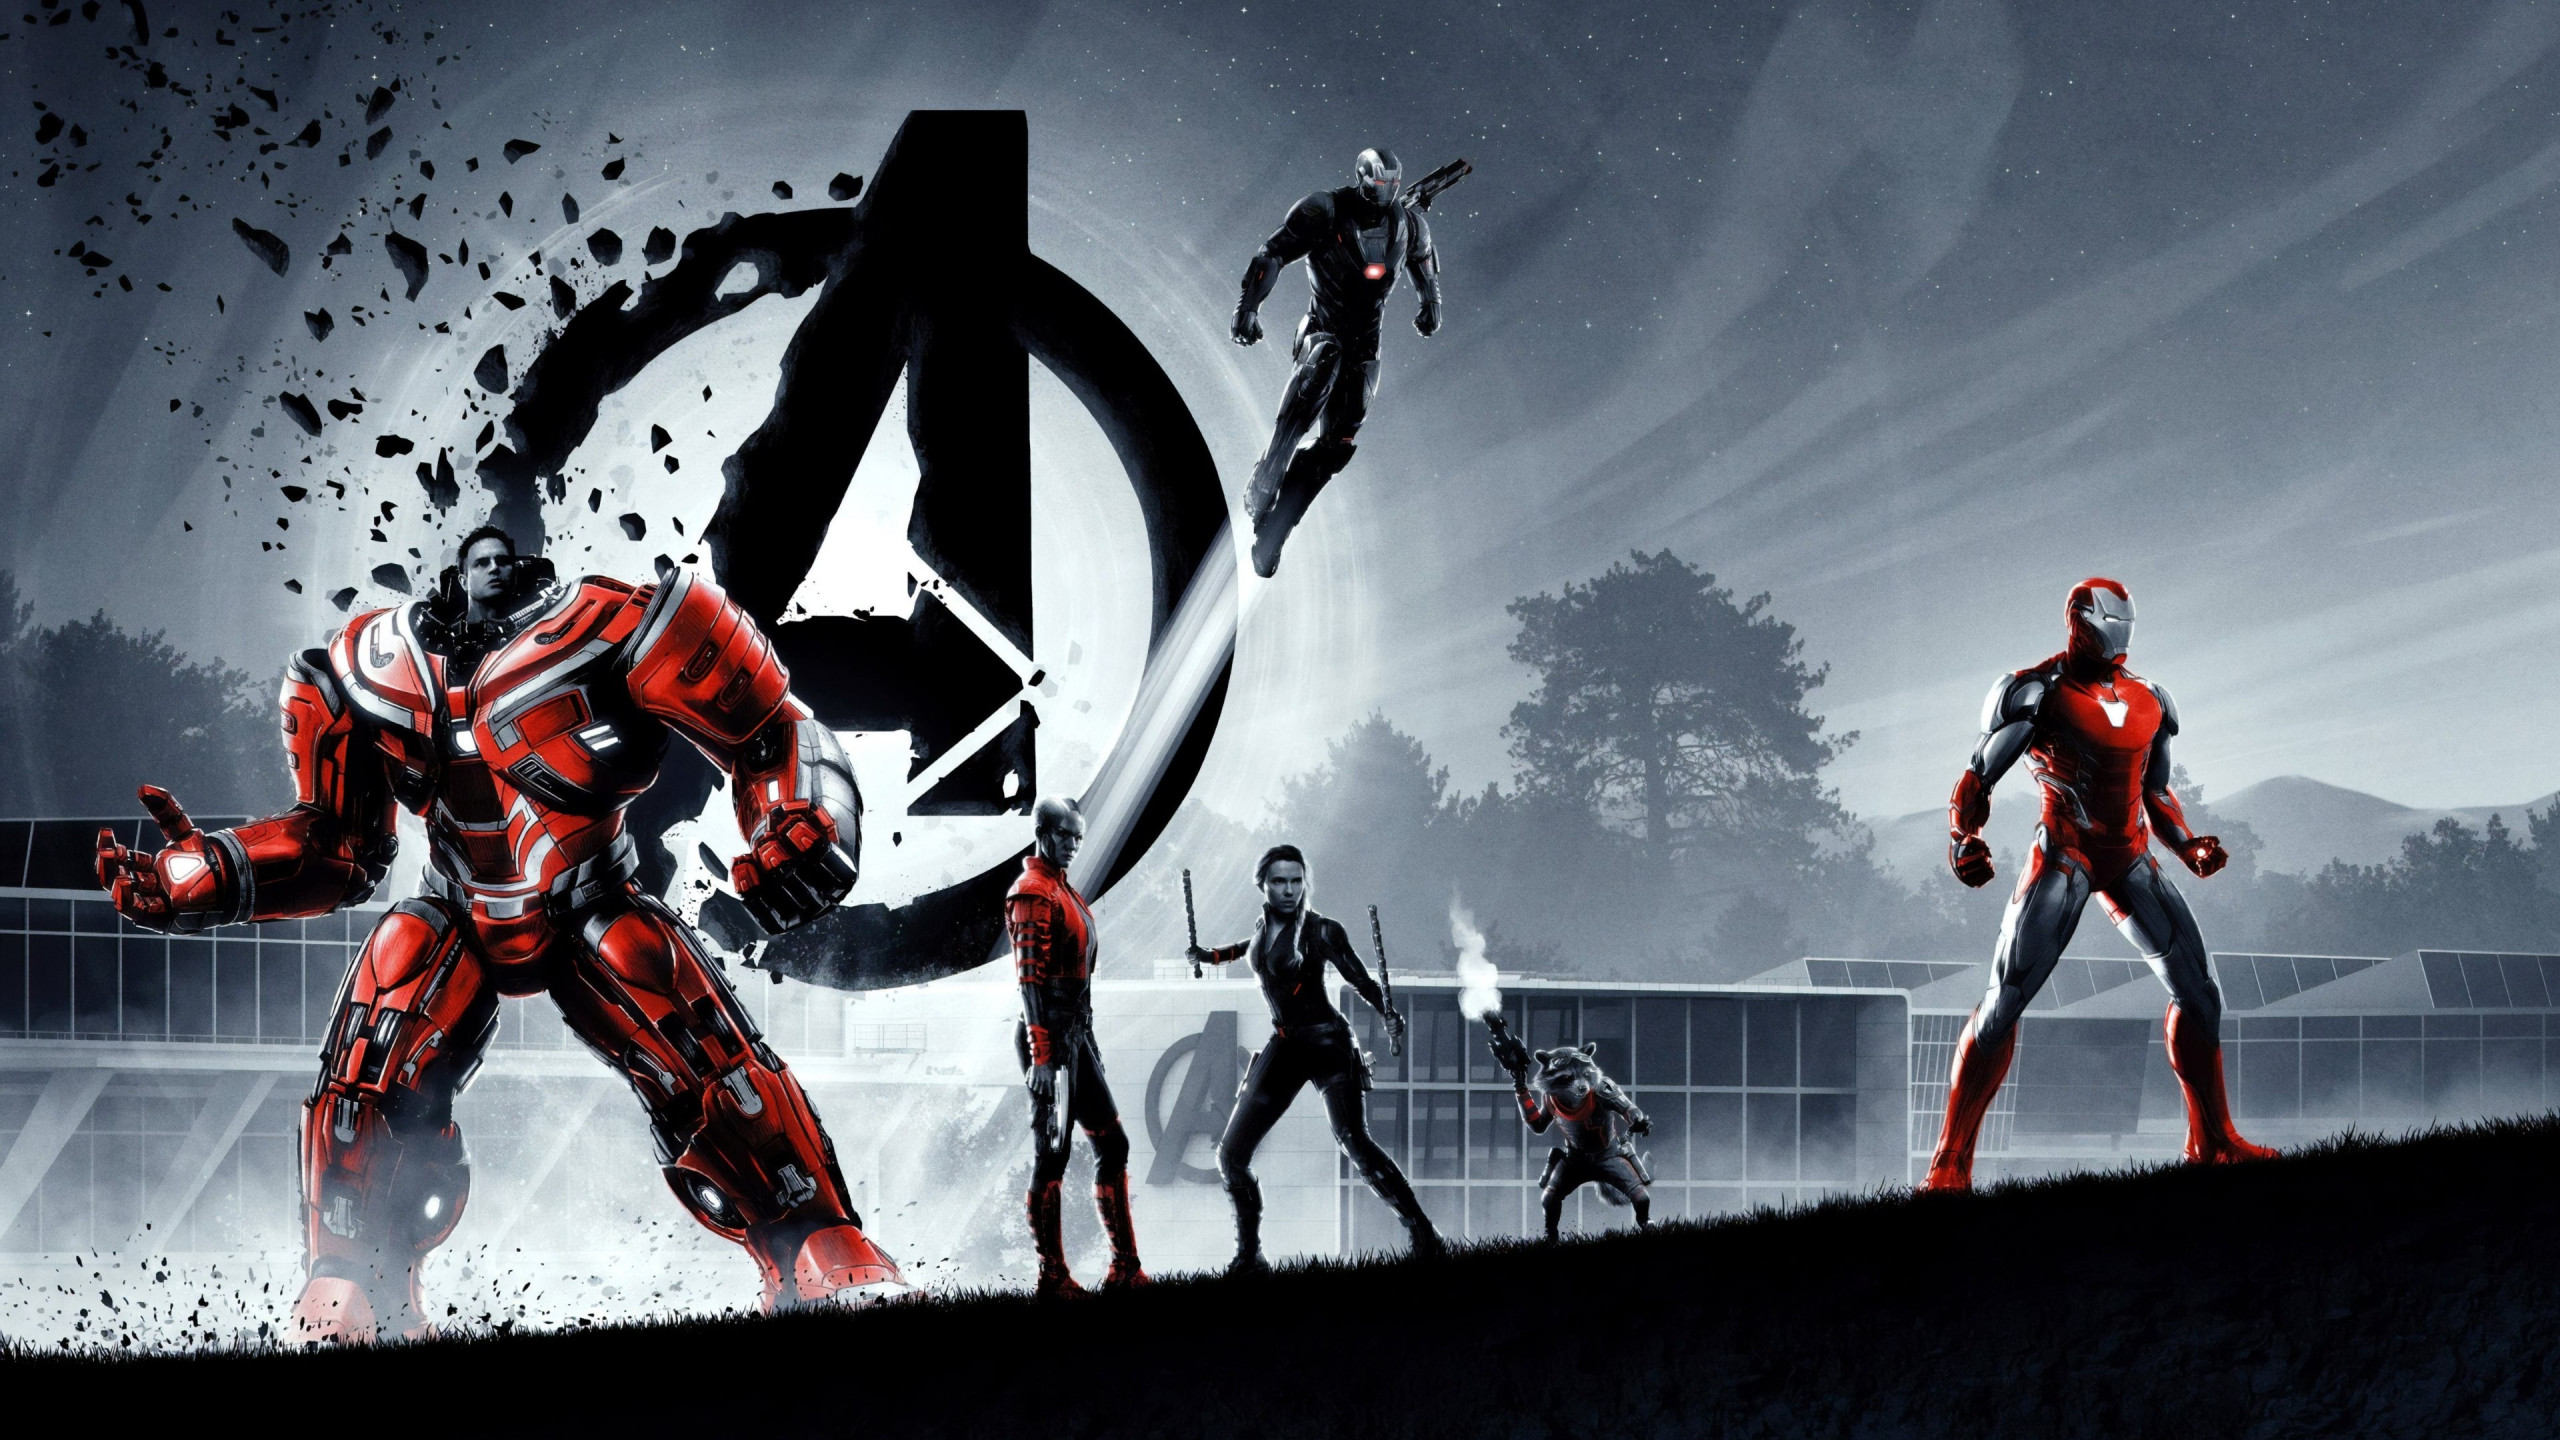 Vertical Wallpaper Hd Download Wallpaper Avengers Endgame Superheroes 2560x1440